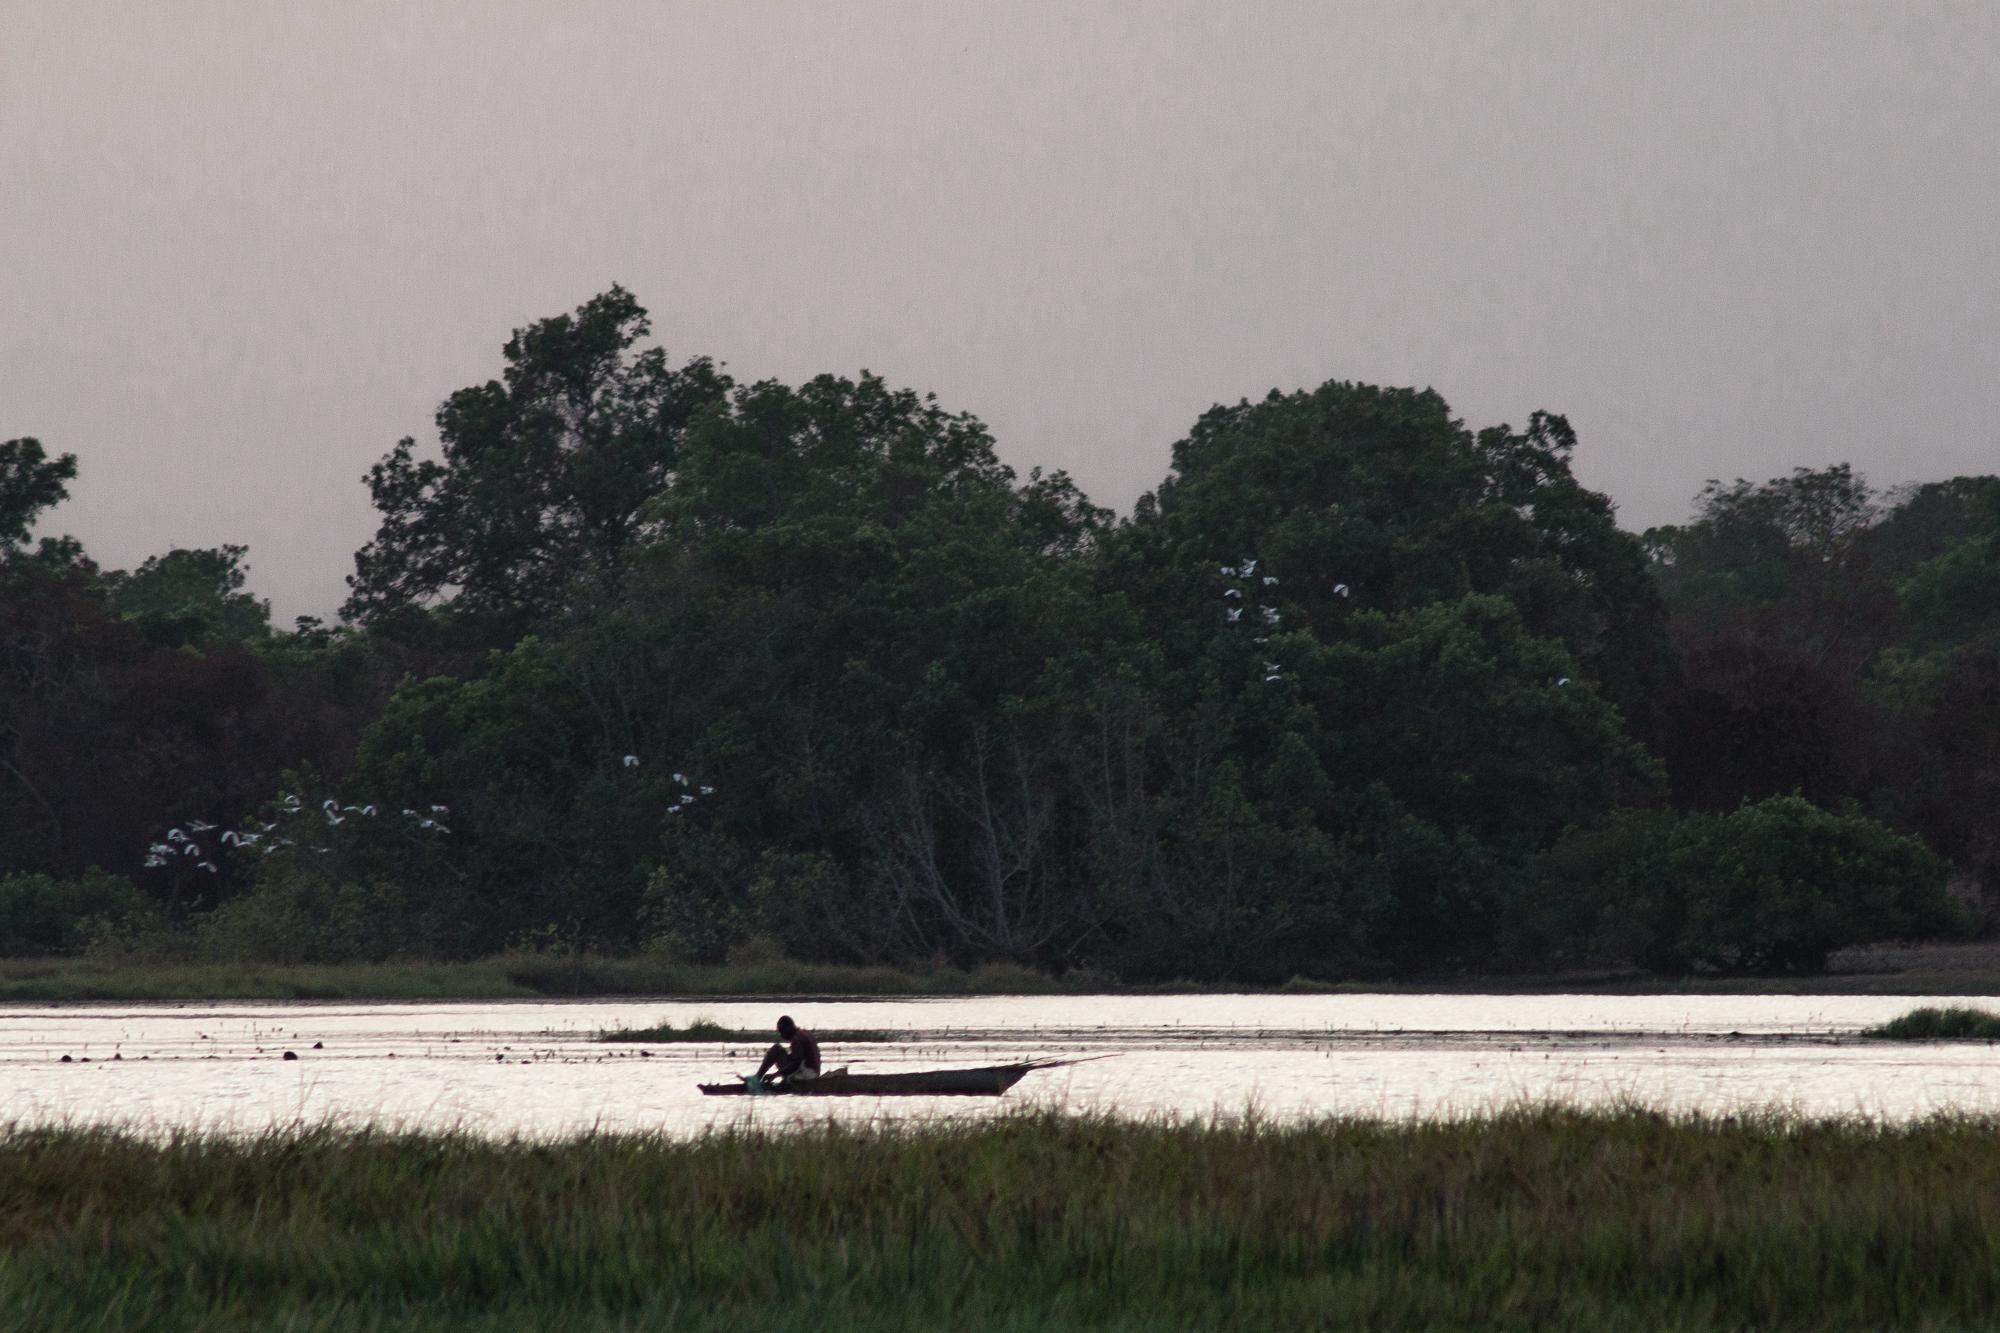 Pêcheur en pirogue sur le lac de Tengrela, région de Banfora, Burkina Faso